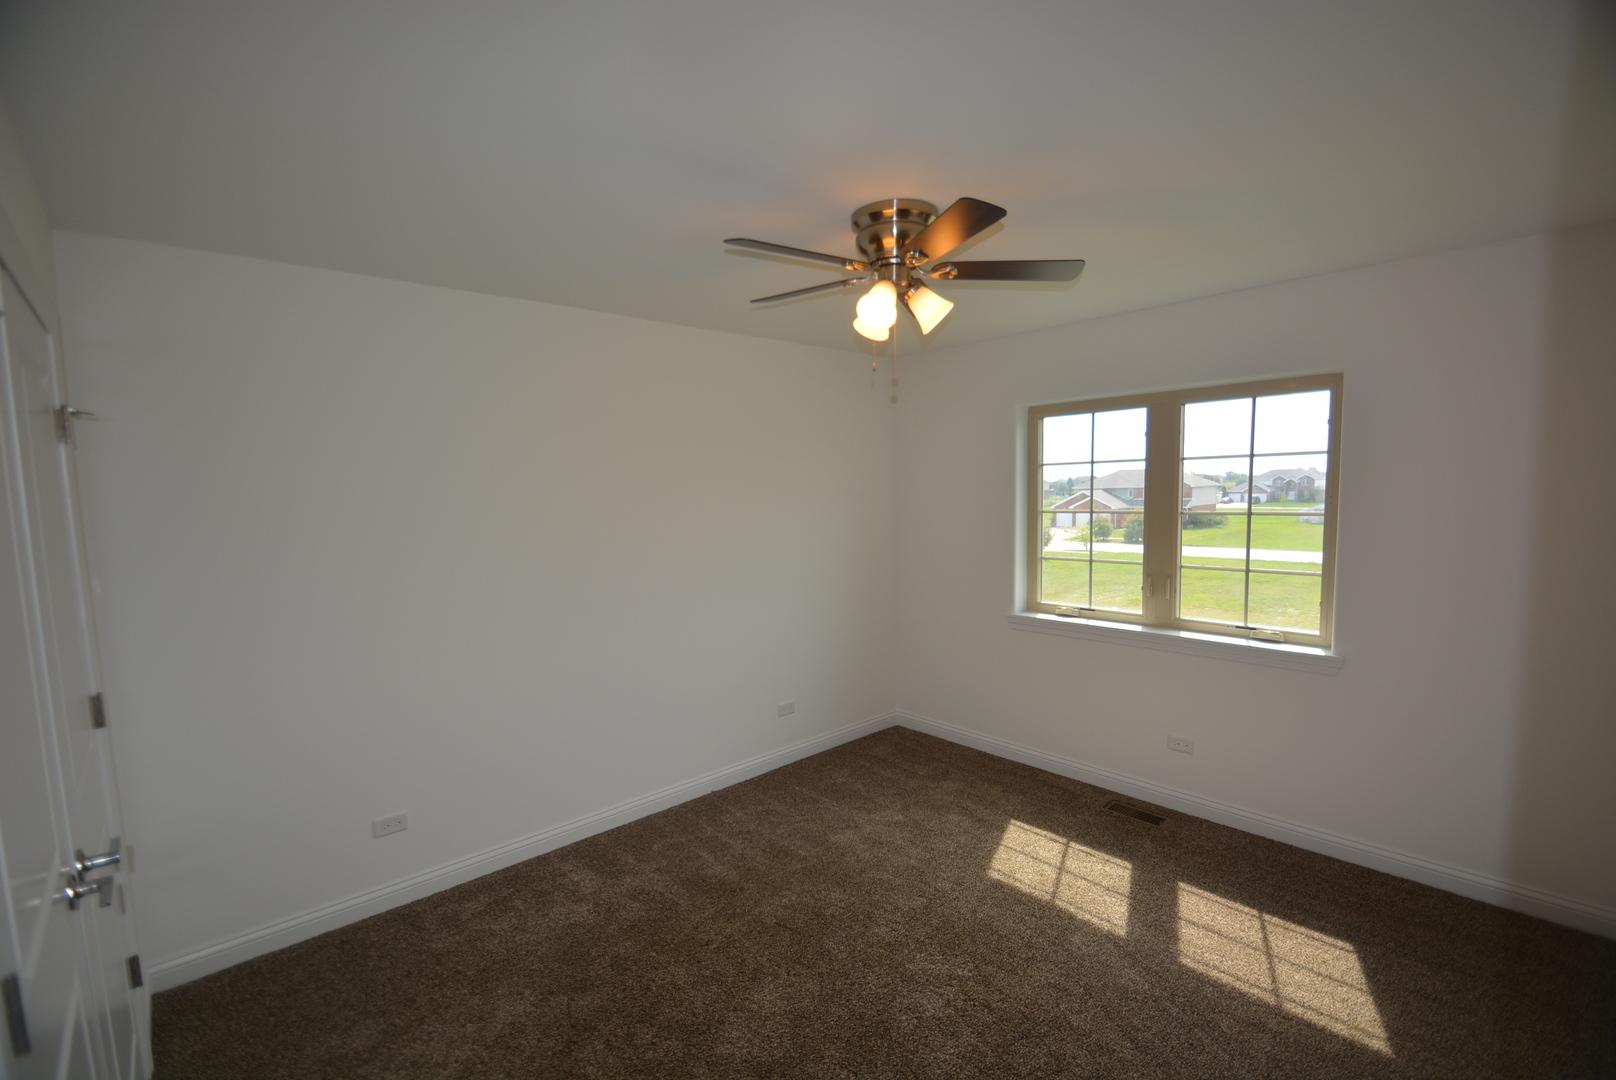 4993 West Margaret, Monee, Illinois, 60449